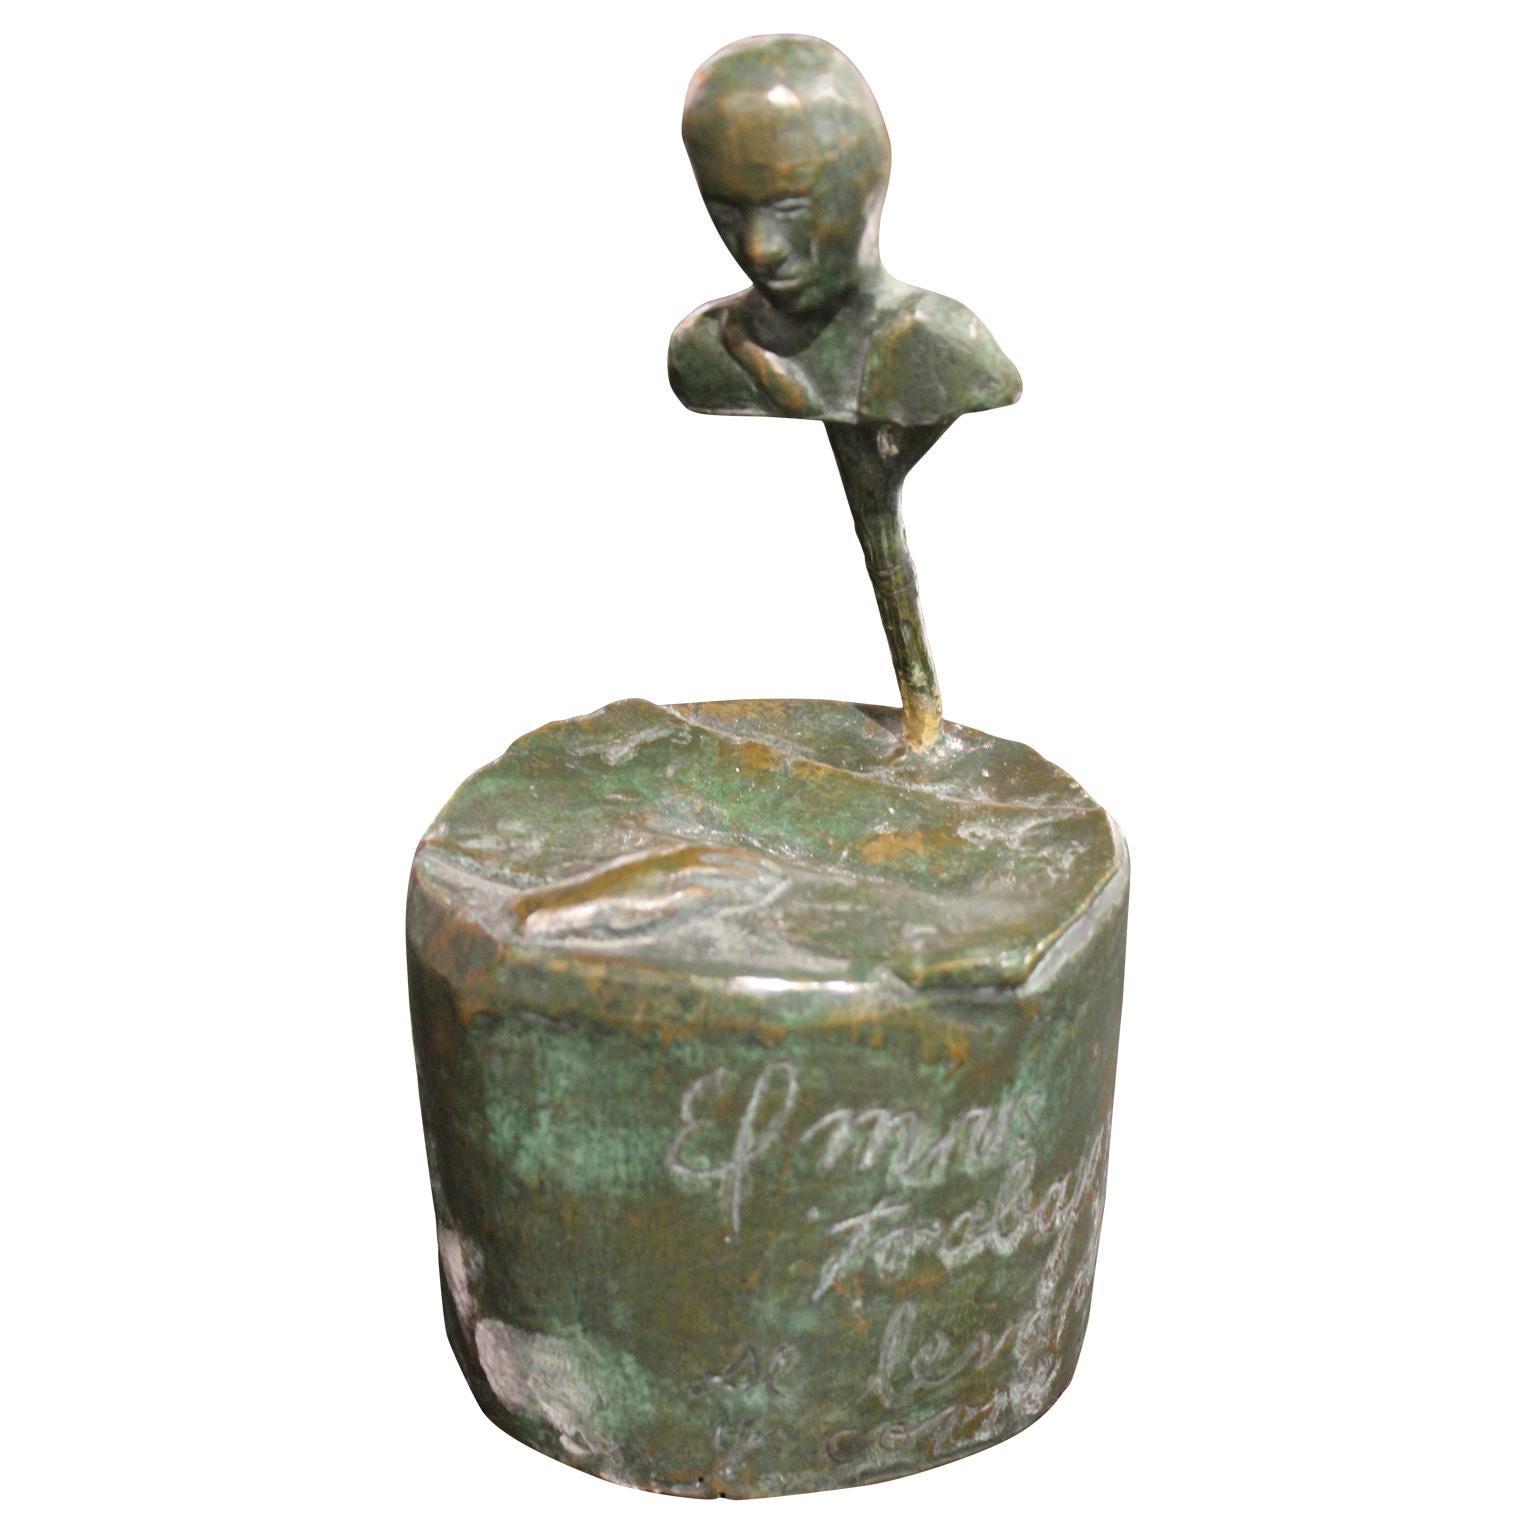 Surrealist Figurative Bronze Sculpture